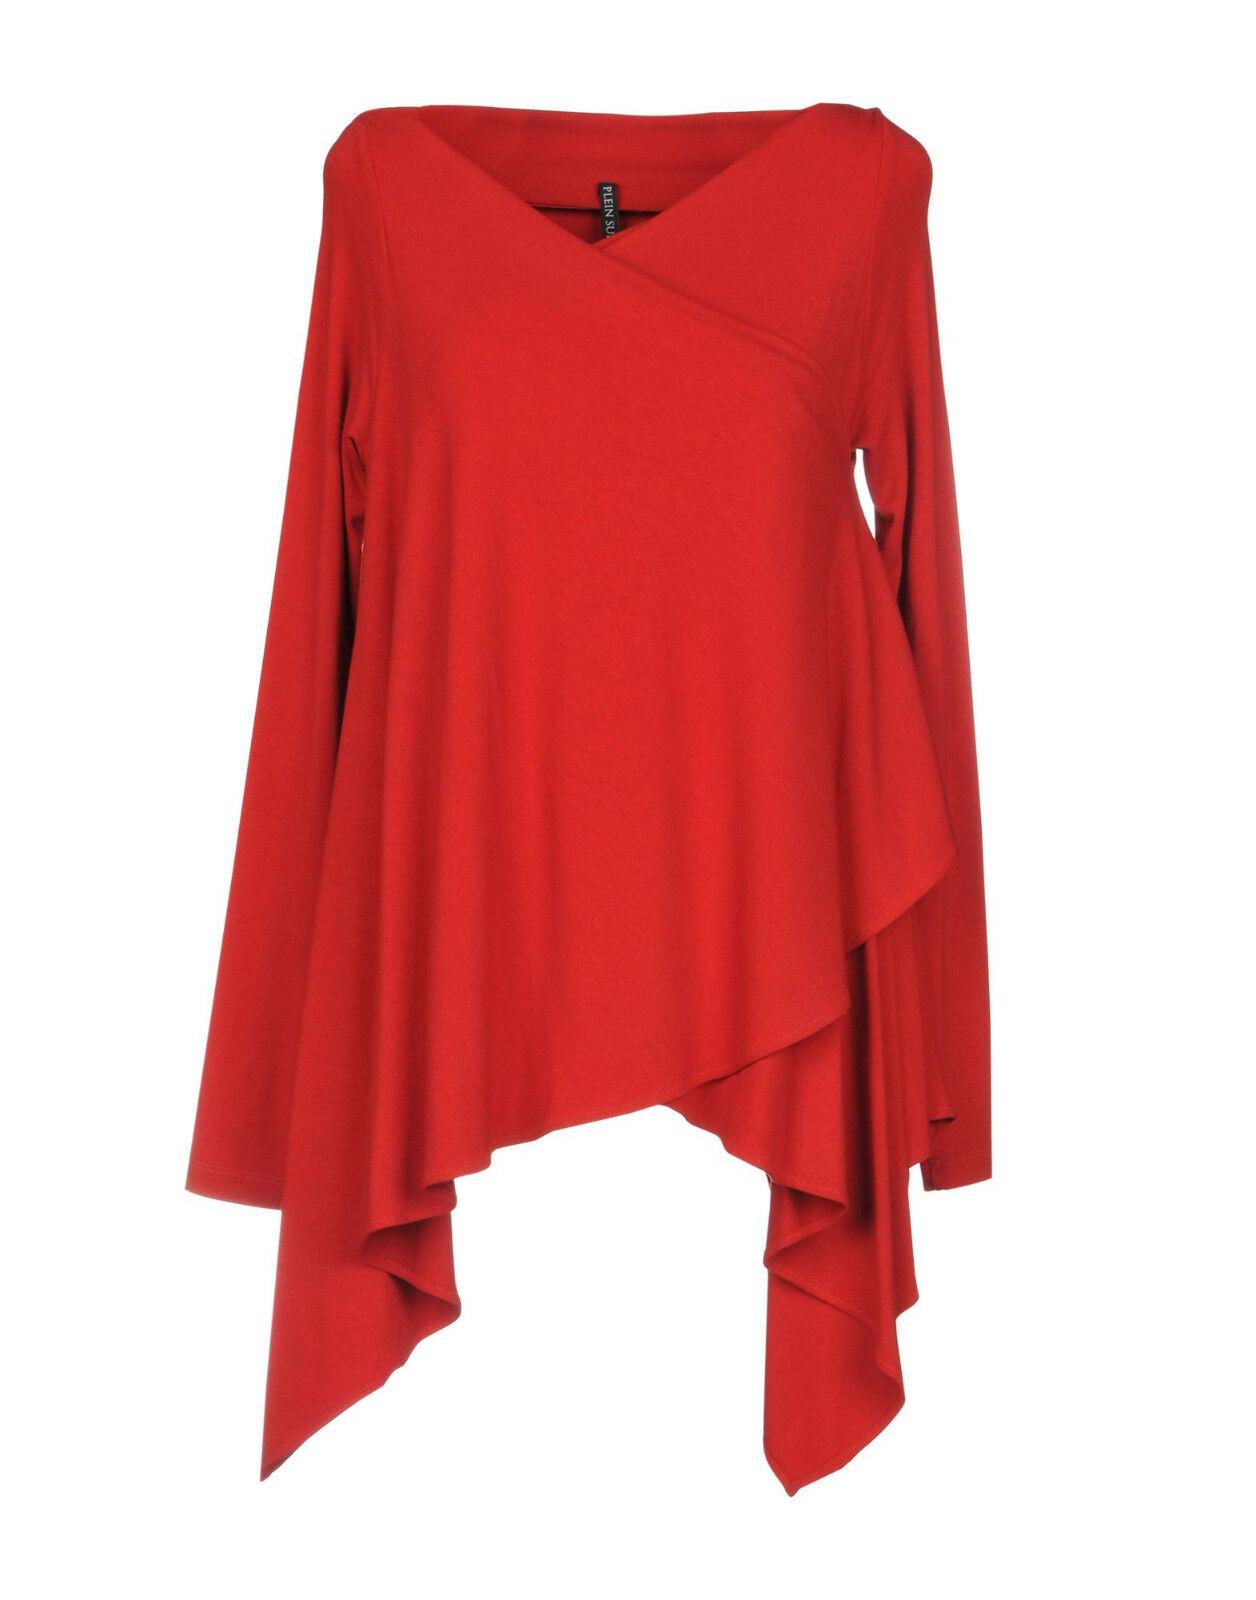 Plein Sud Red Top Size   IT XL US10